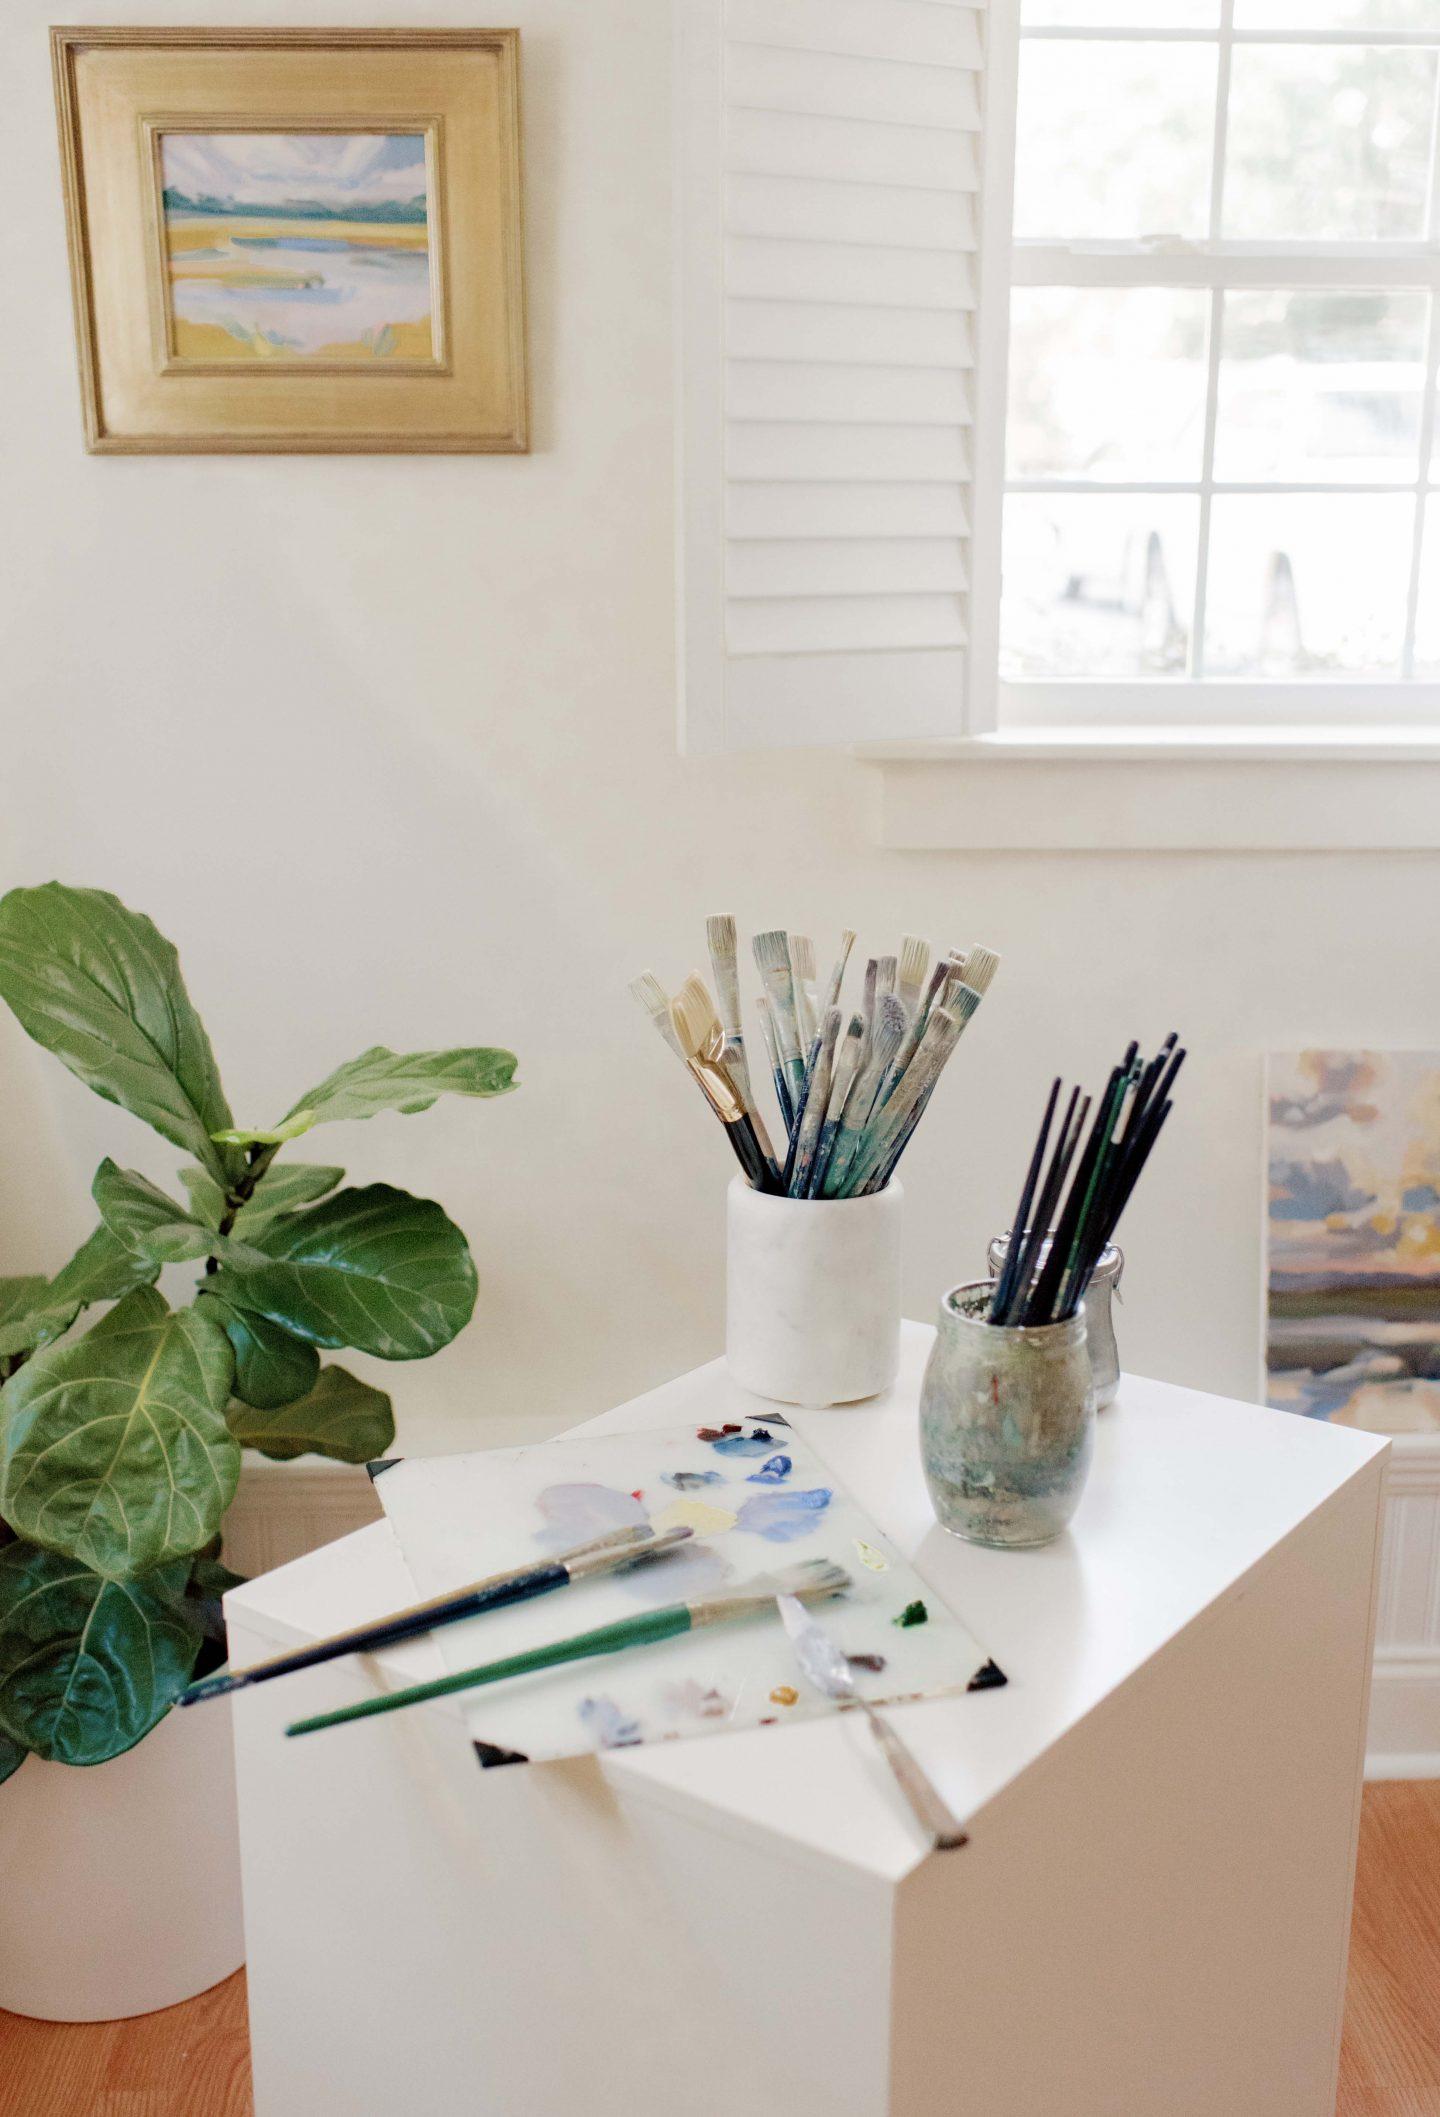 where to get custom painting